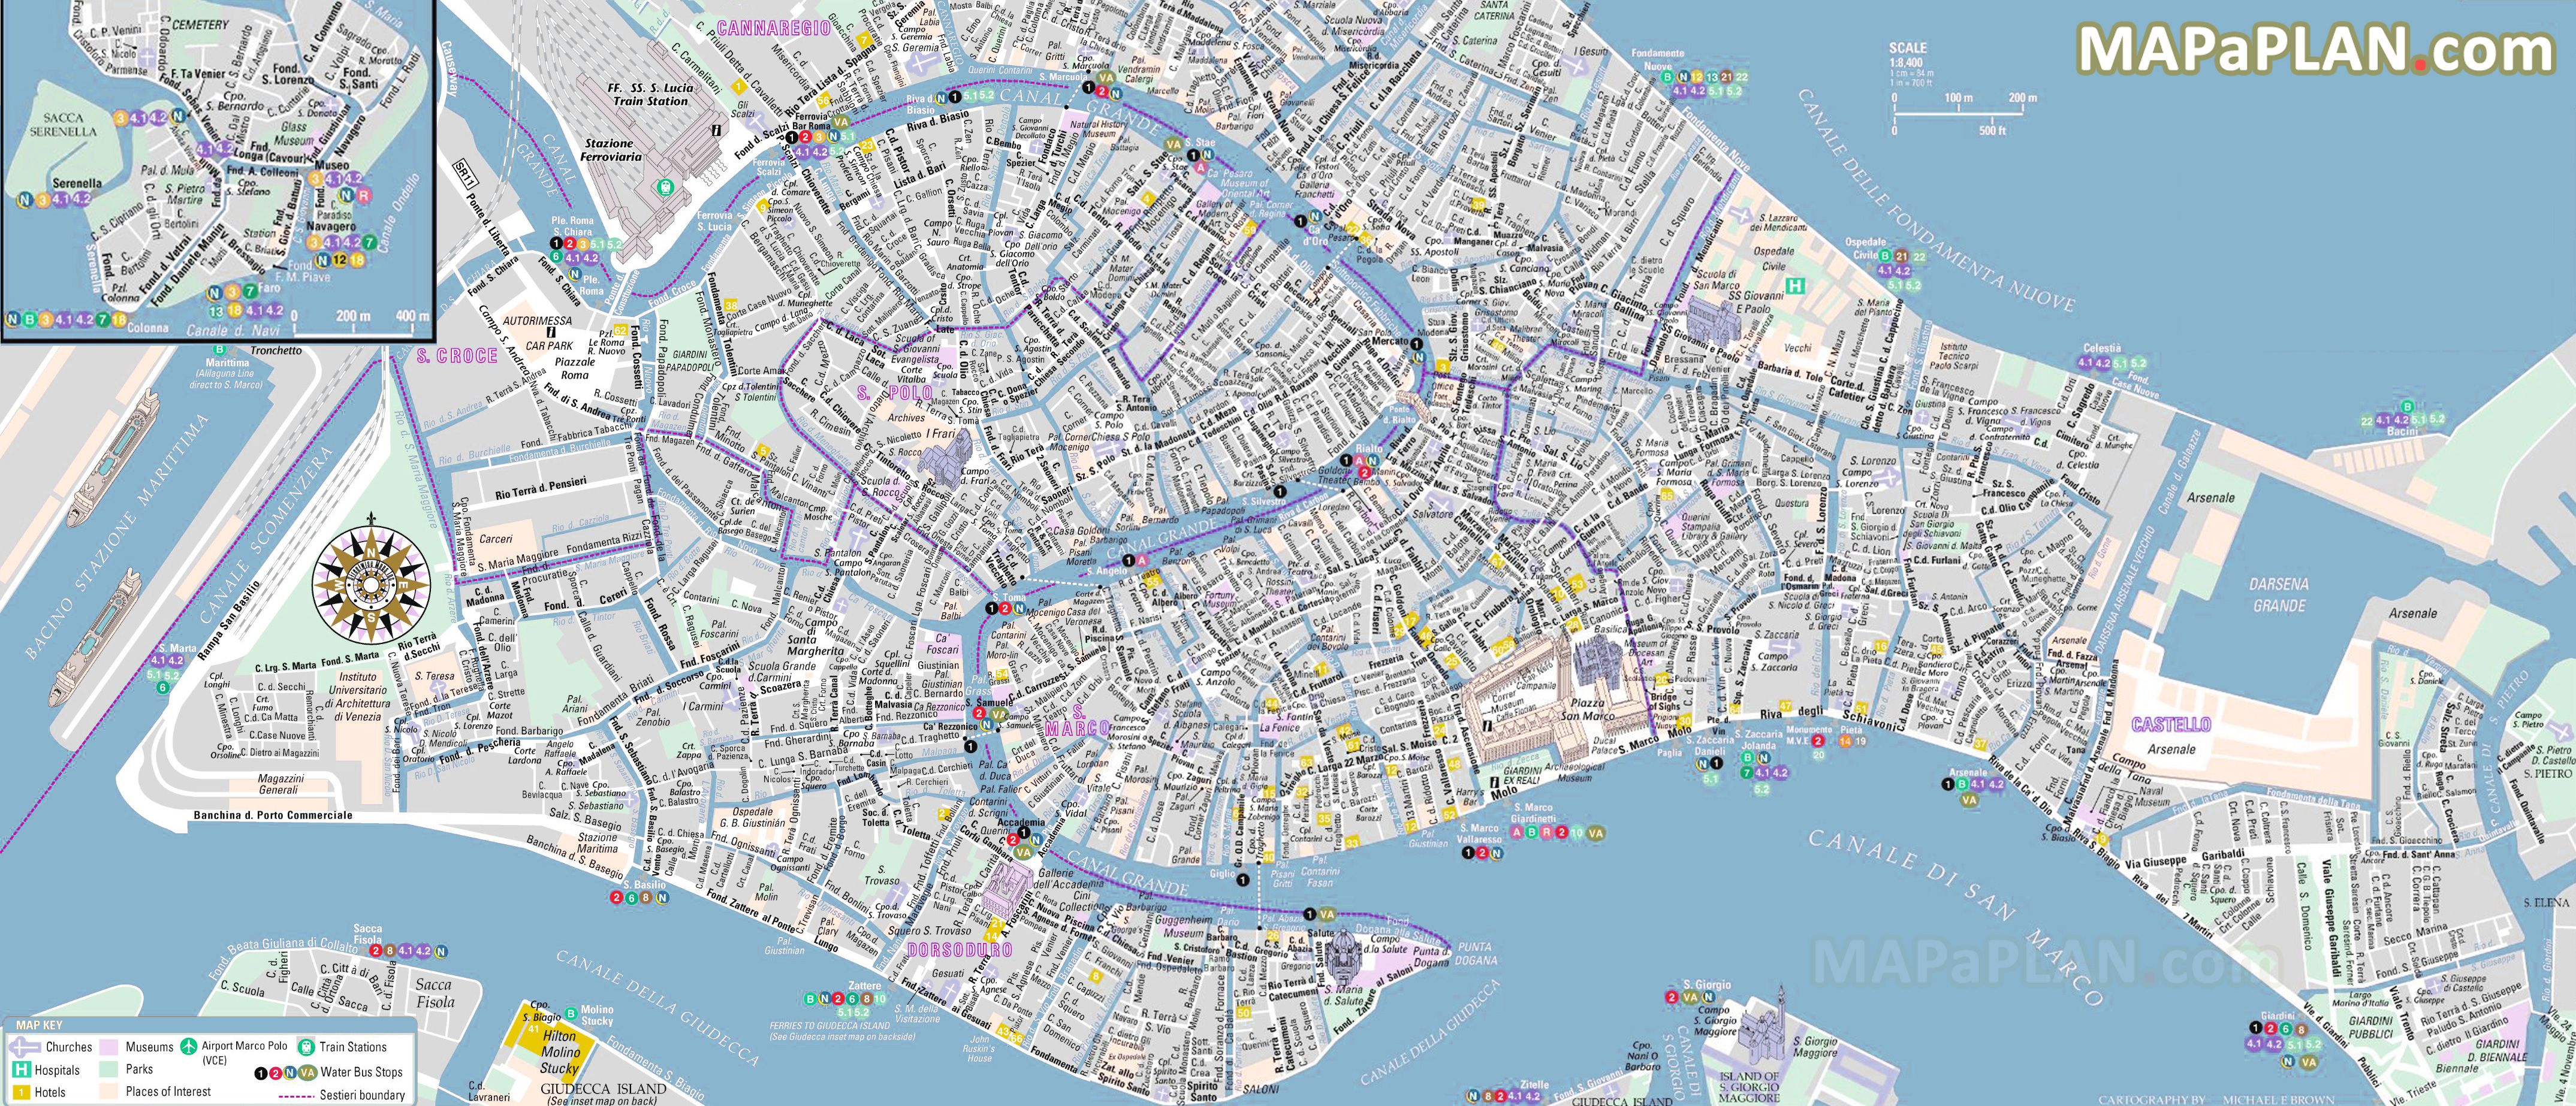 venicetoptouristattractionsmap12Whattodoandwheretogoin